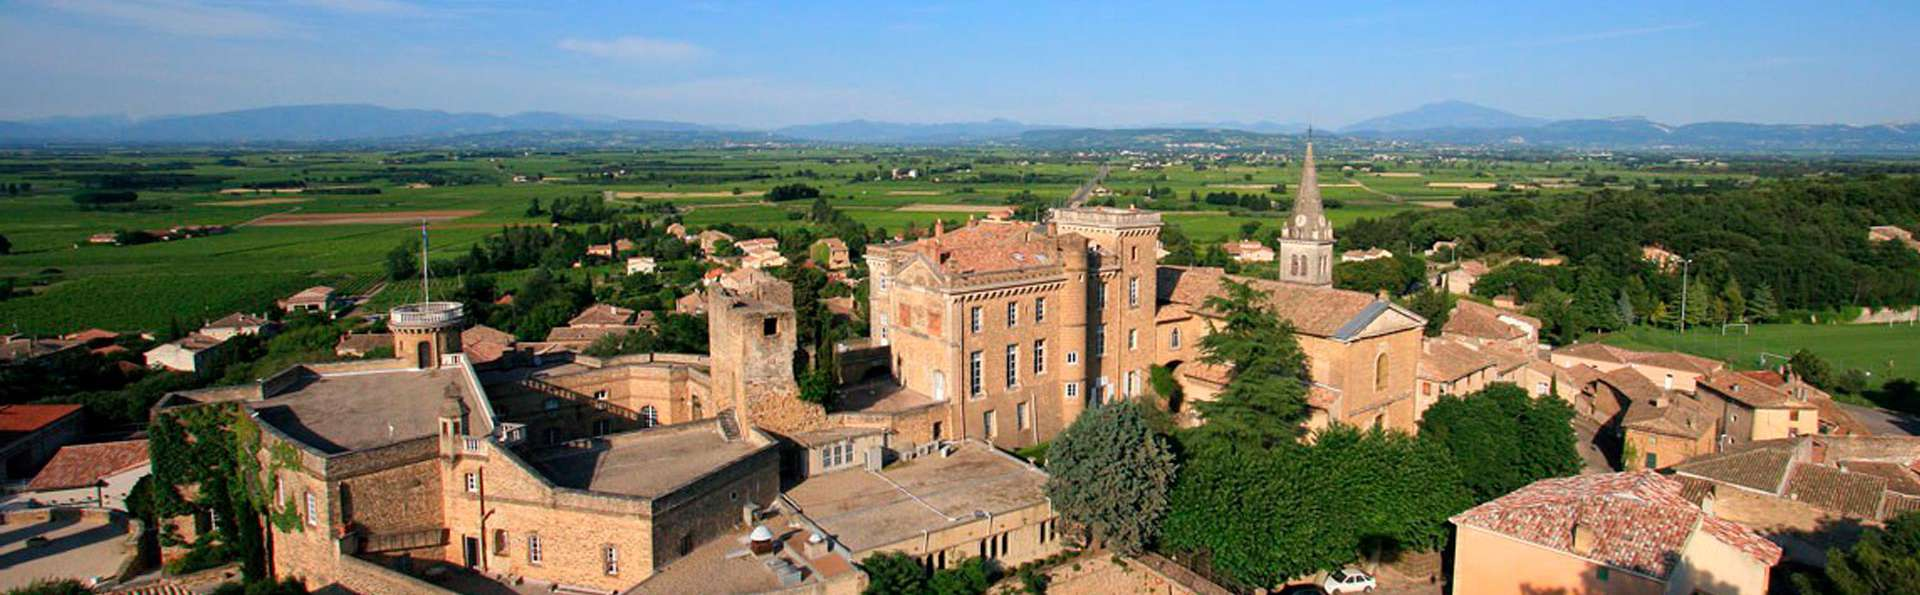 Château de Rochegude - edit_destination.jpg